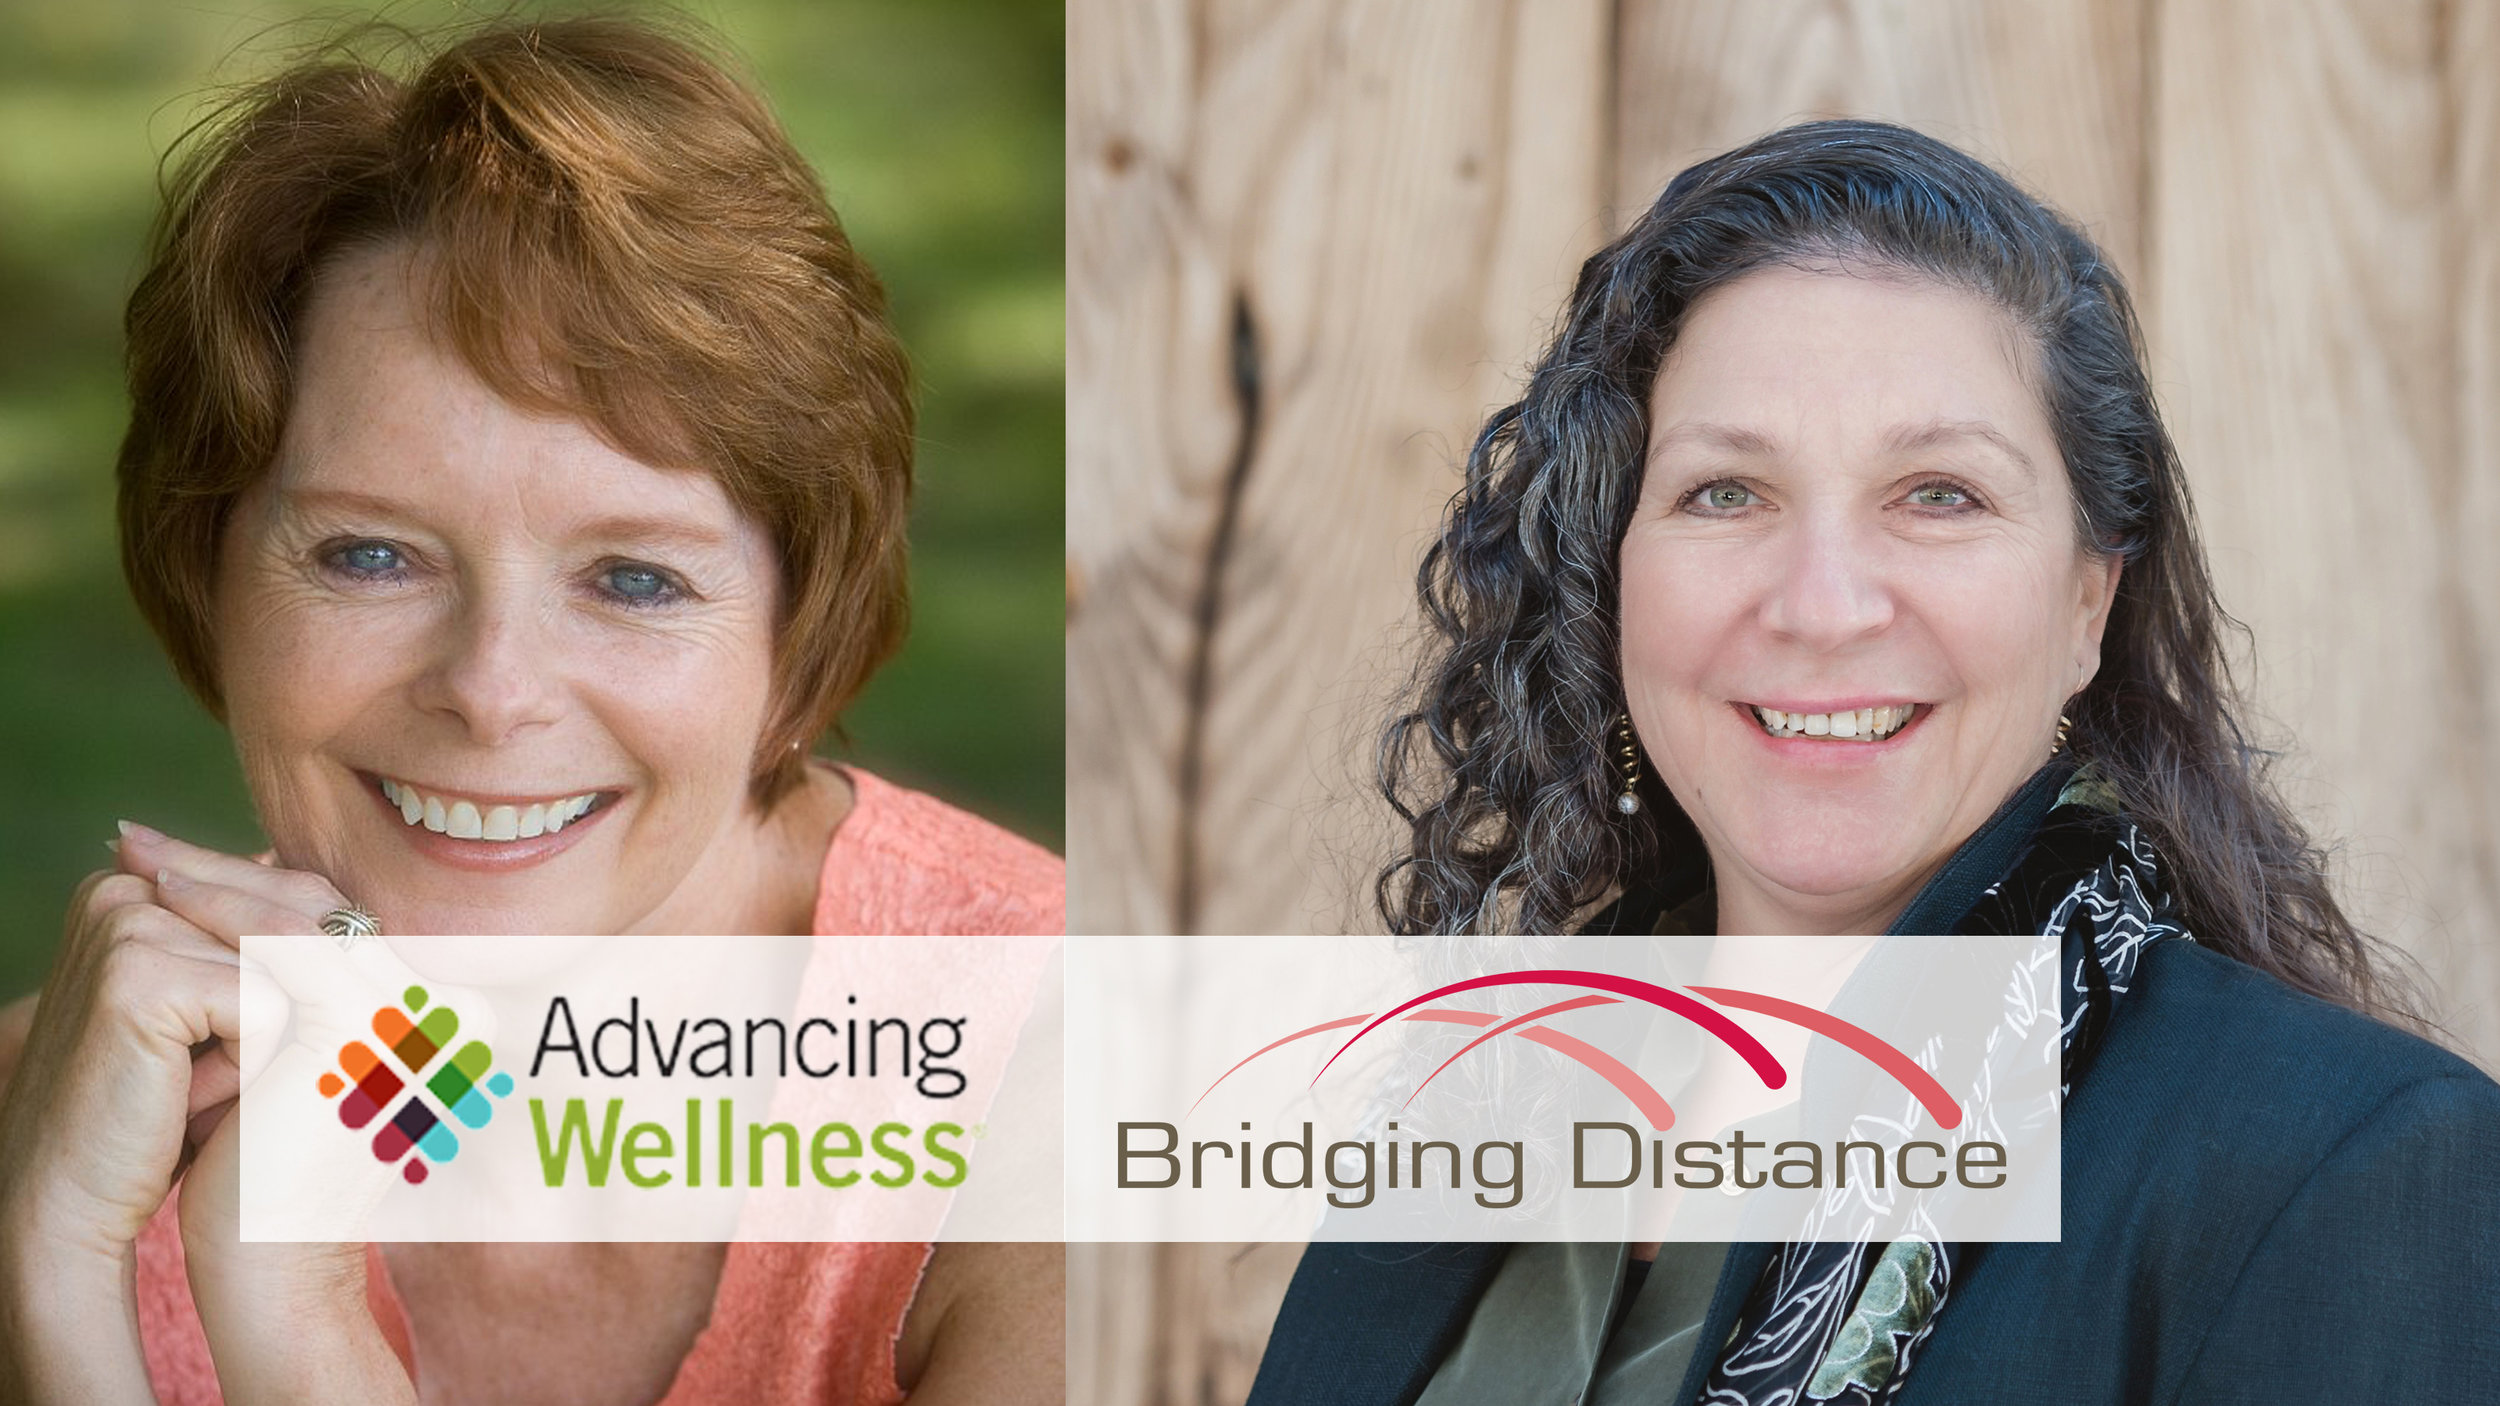 advancing-wellness-mari-ryan-bridging-distance-stefanie-heiter.jpg